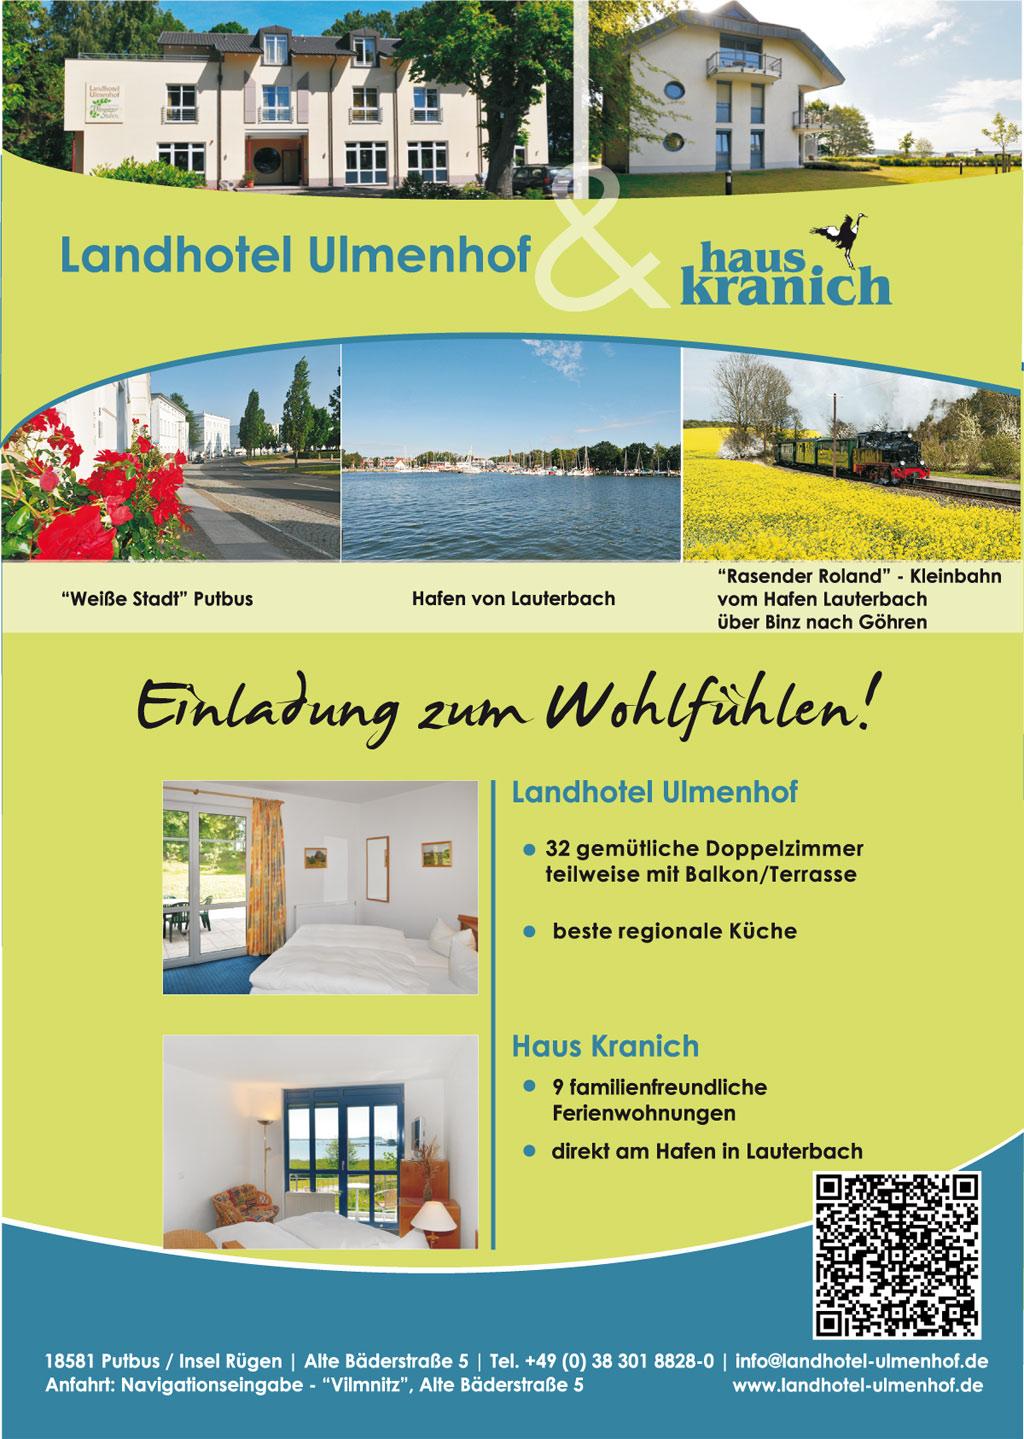 Grafik & Design Referenzen: Flyer DIN A5 - Landhotel Ulmenhof